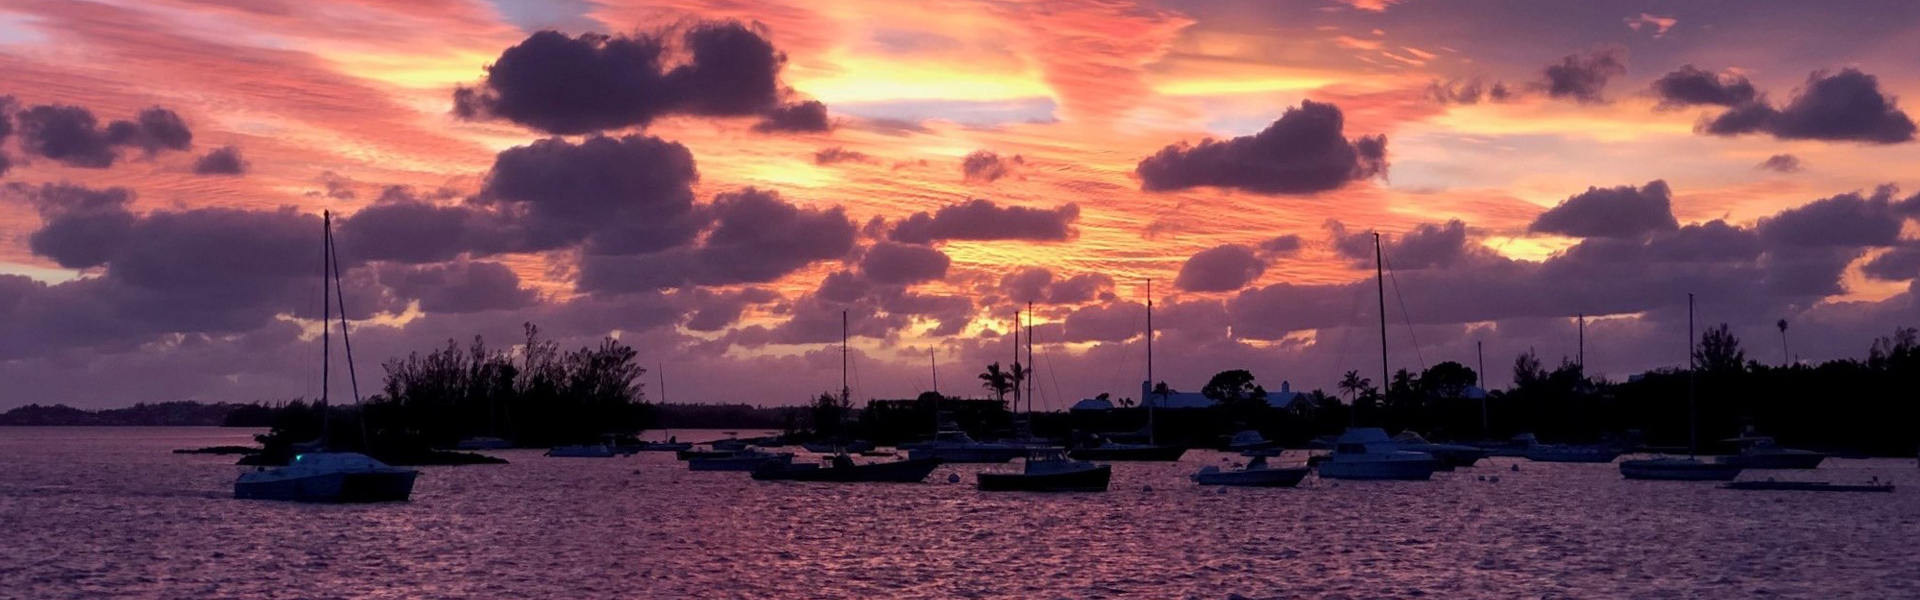 Sunset Darrells Wharf Bermuda